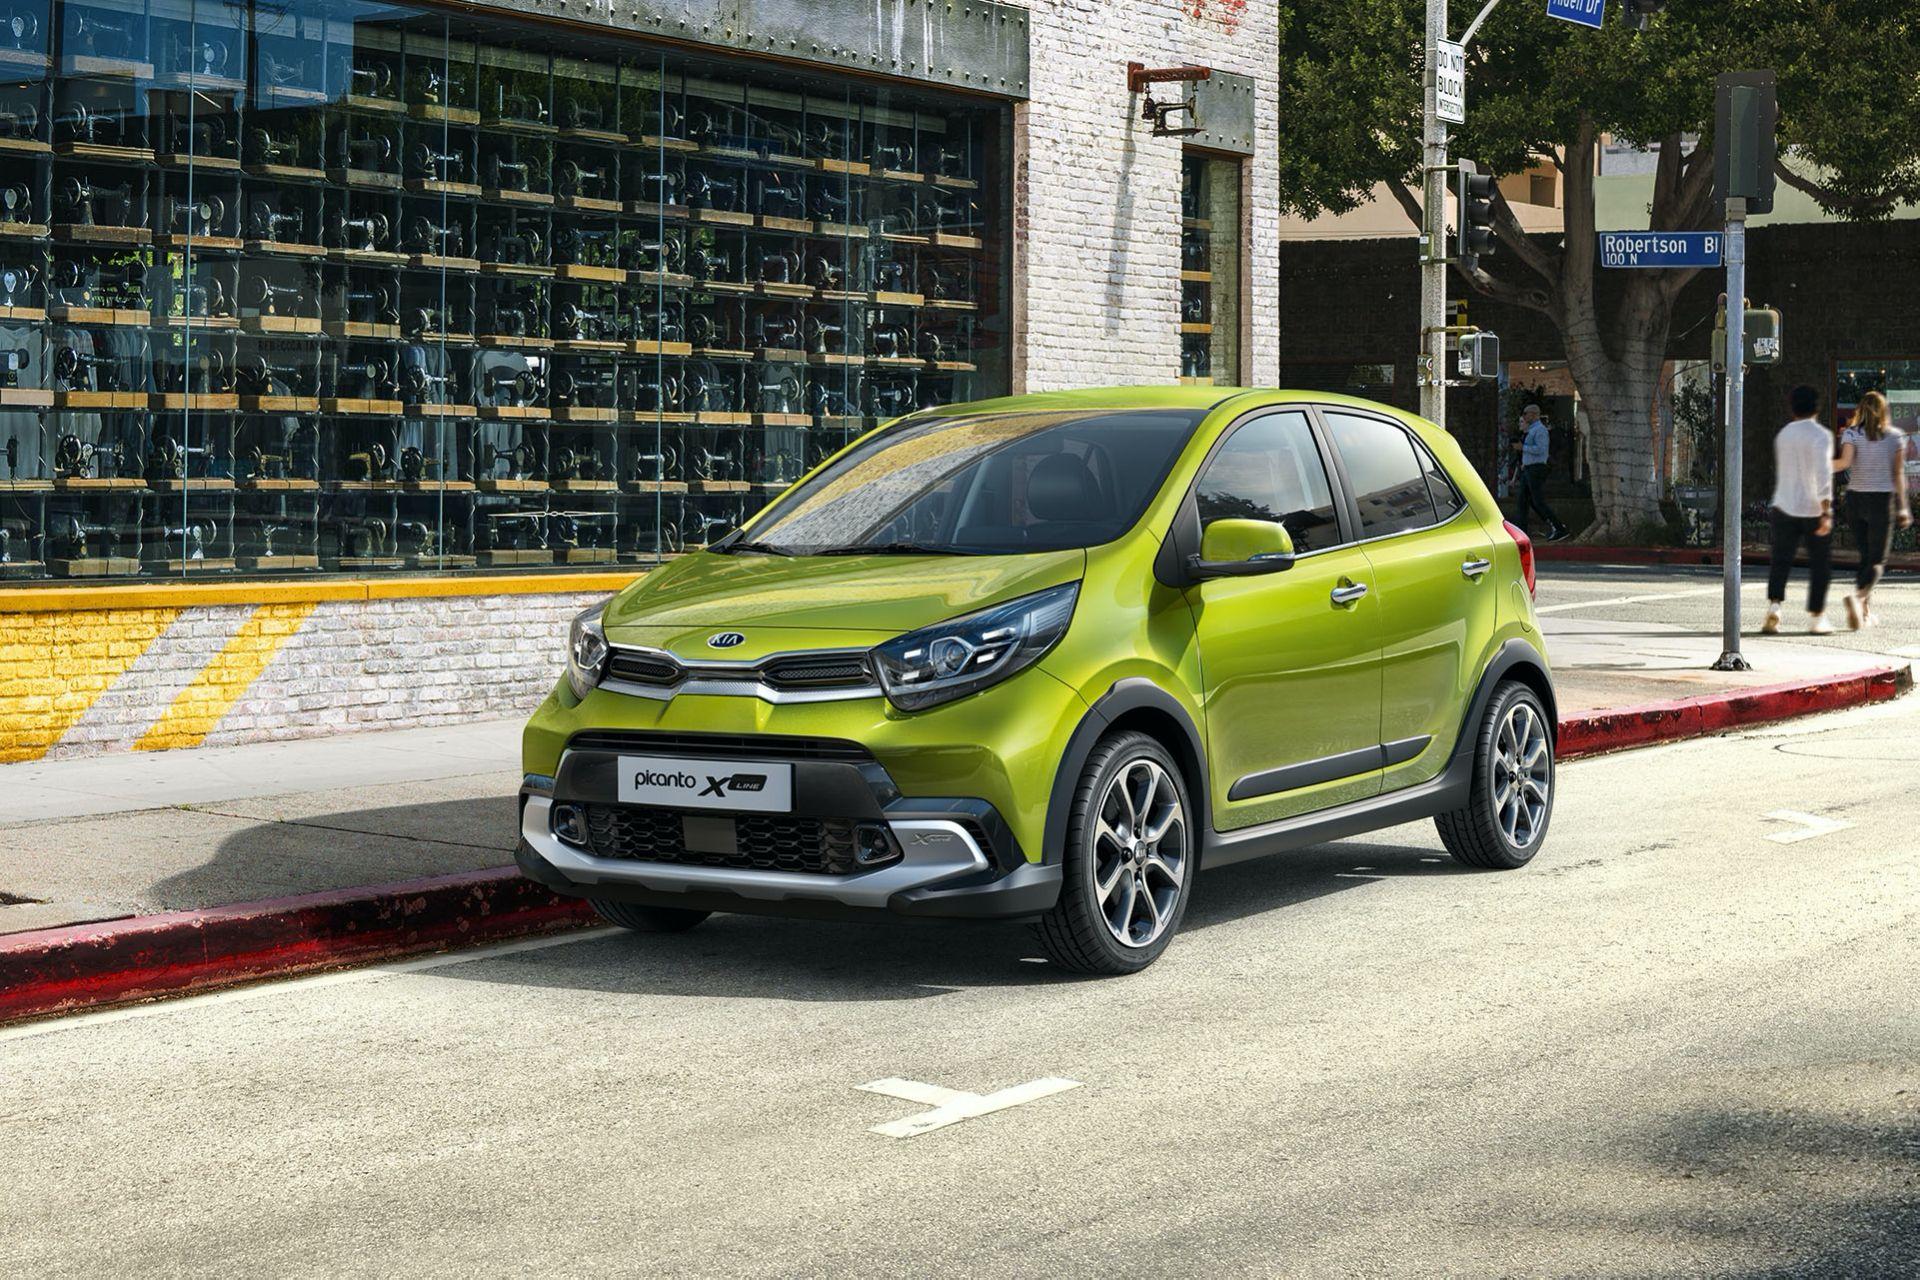 2021-Kia-Picanto-facelift-Euro-spec-32